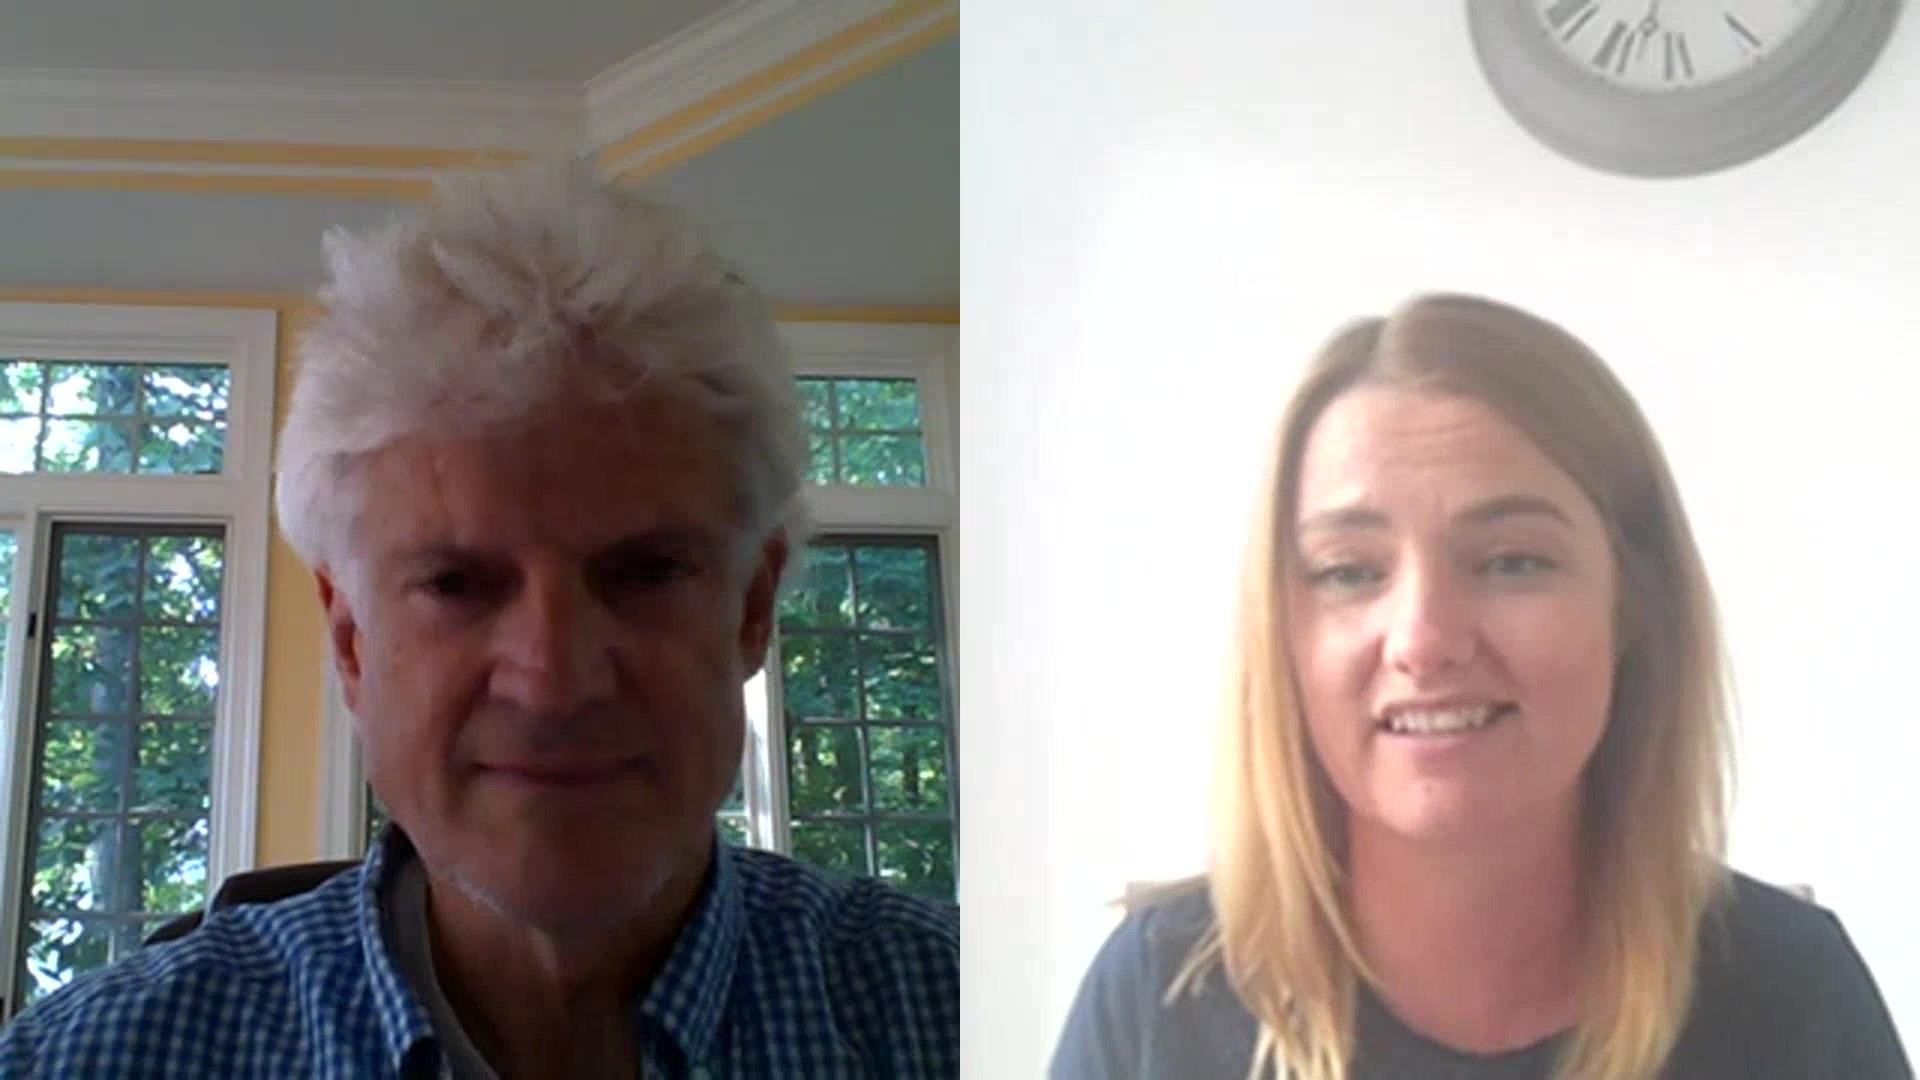 KORE - Quickfire Interview - Steve Braig - An Overview of Industrial IoT Today